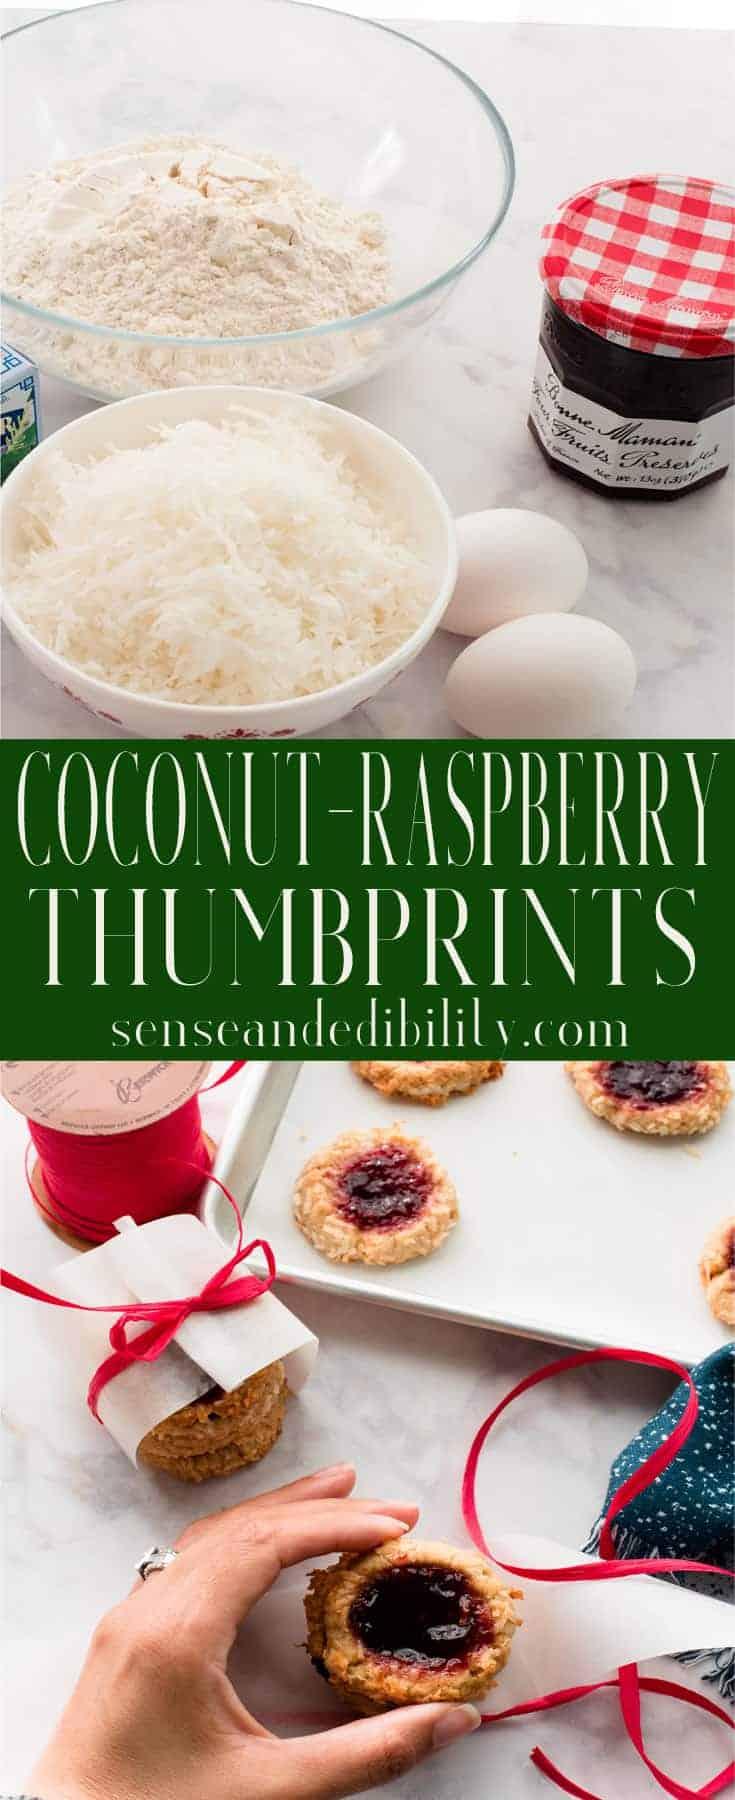 Sense & Edibility's Coconut-Raspberry Thumbprints Pin